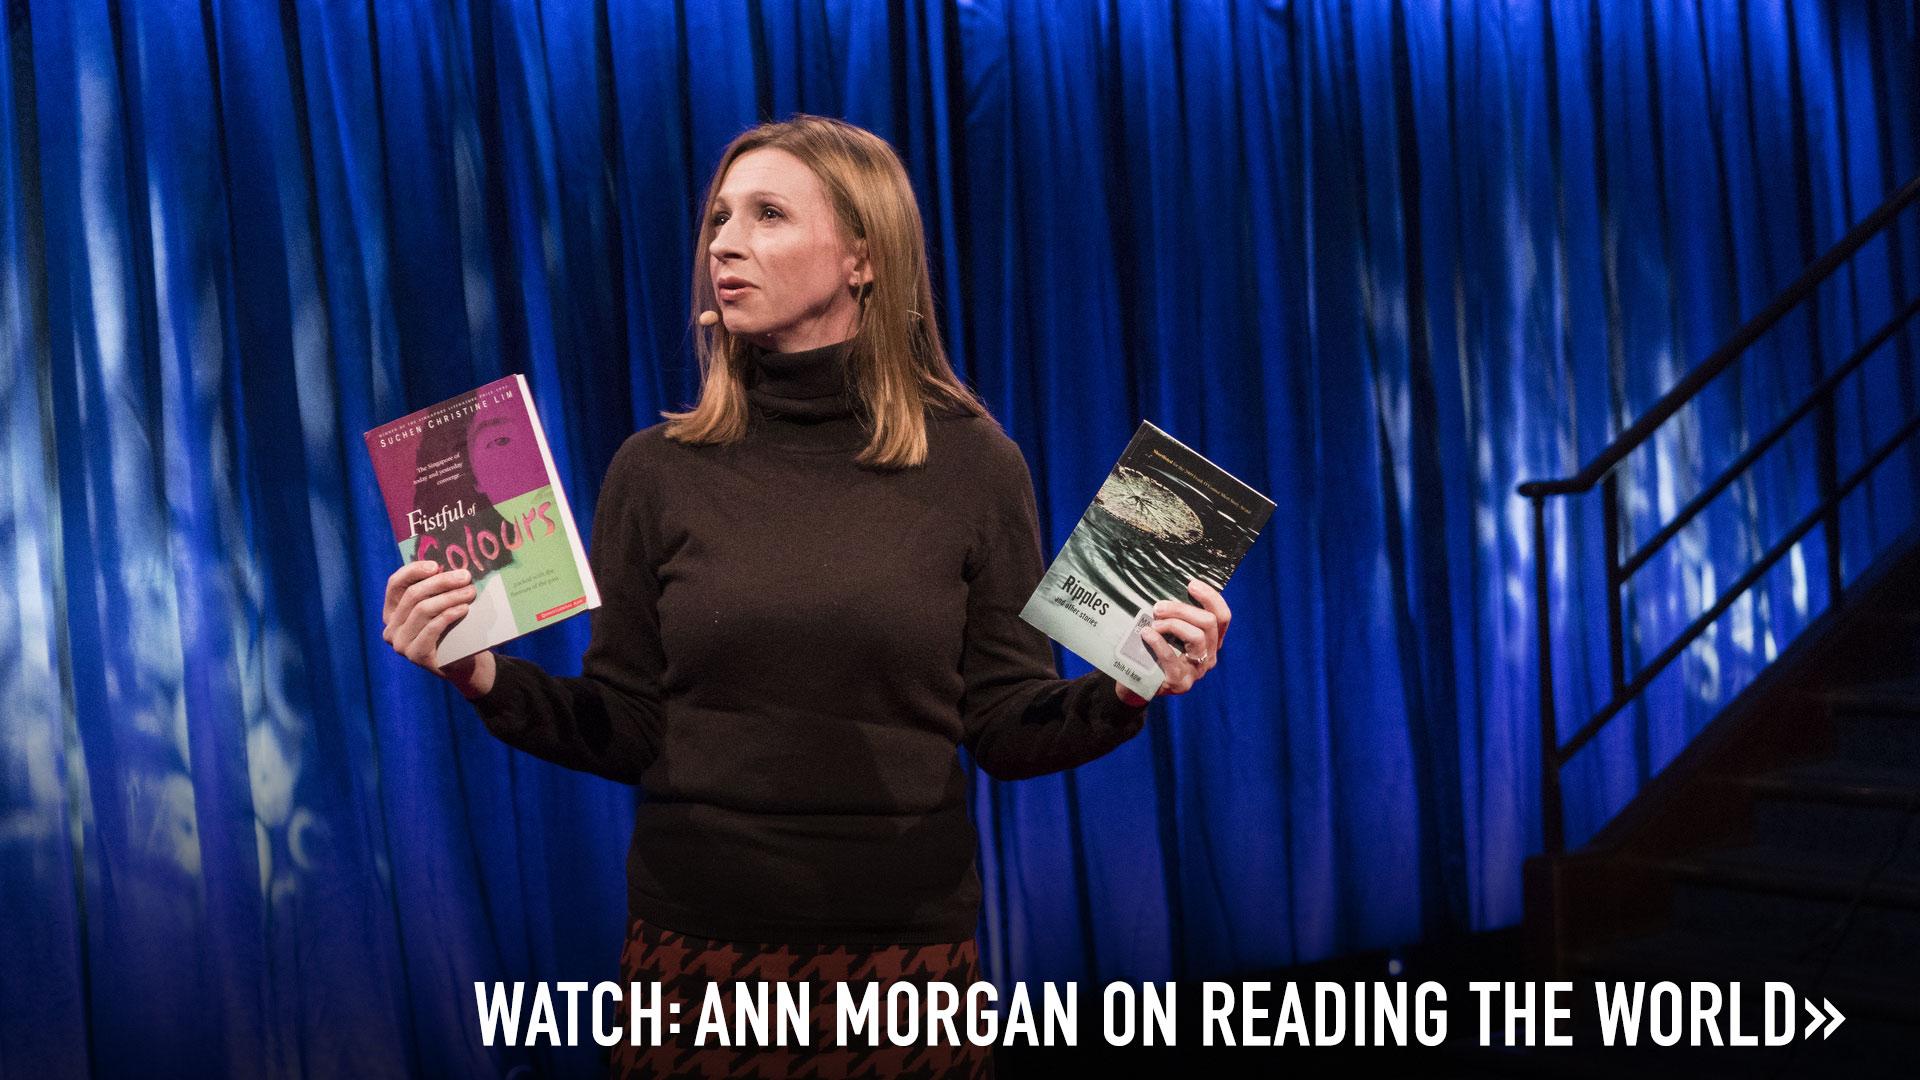 ann_morgan_reading_world_TED